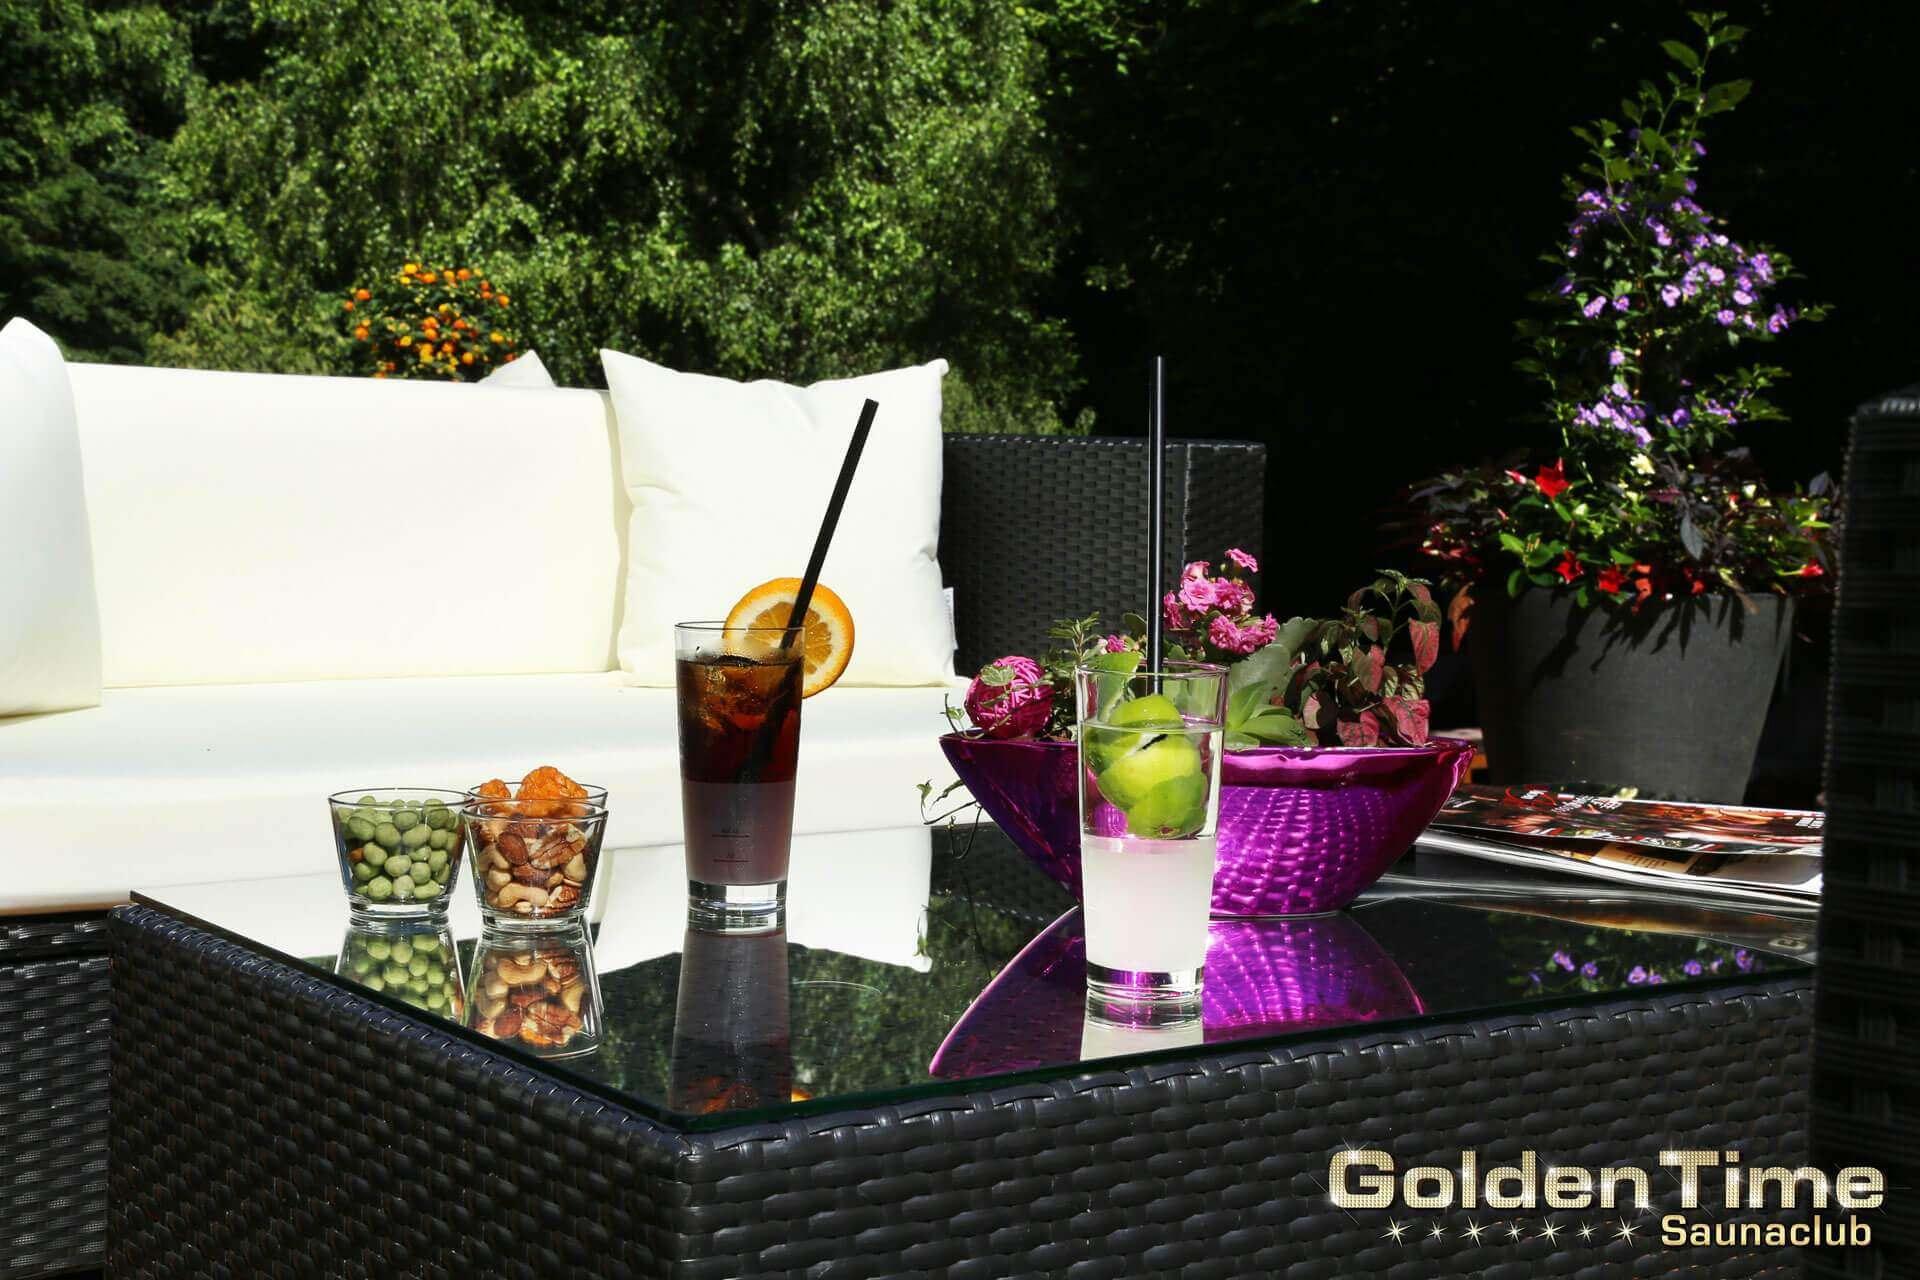 01-terrasse-pic-05-goldentime-saunaclub.jpg